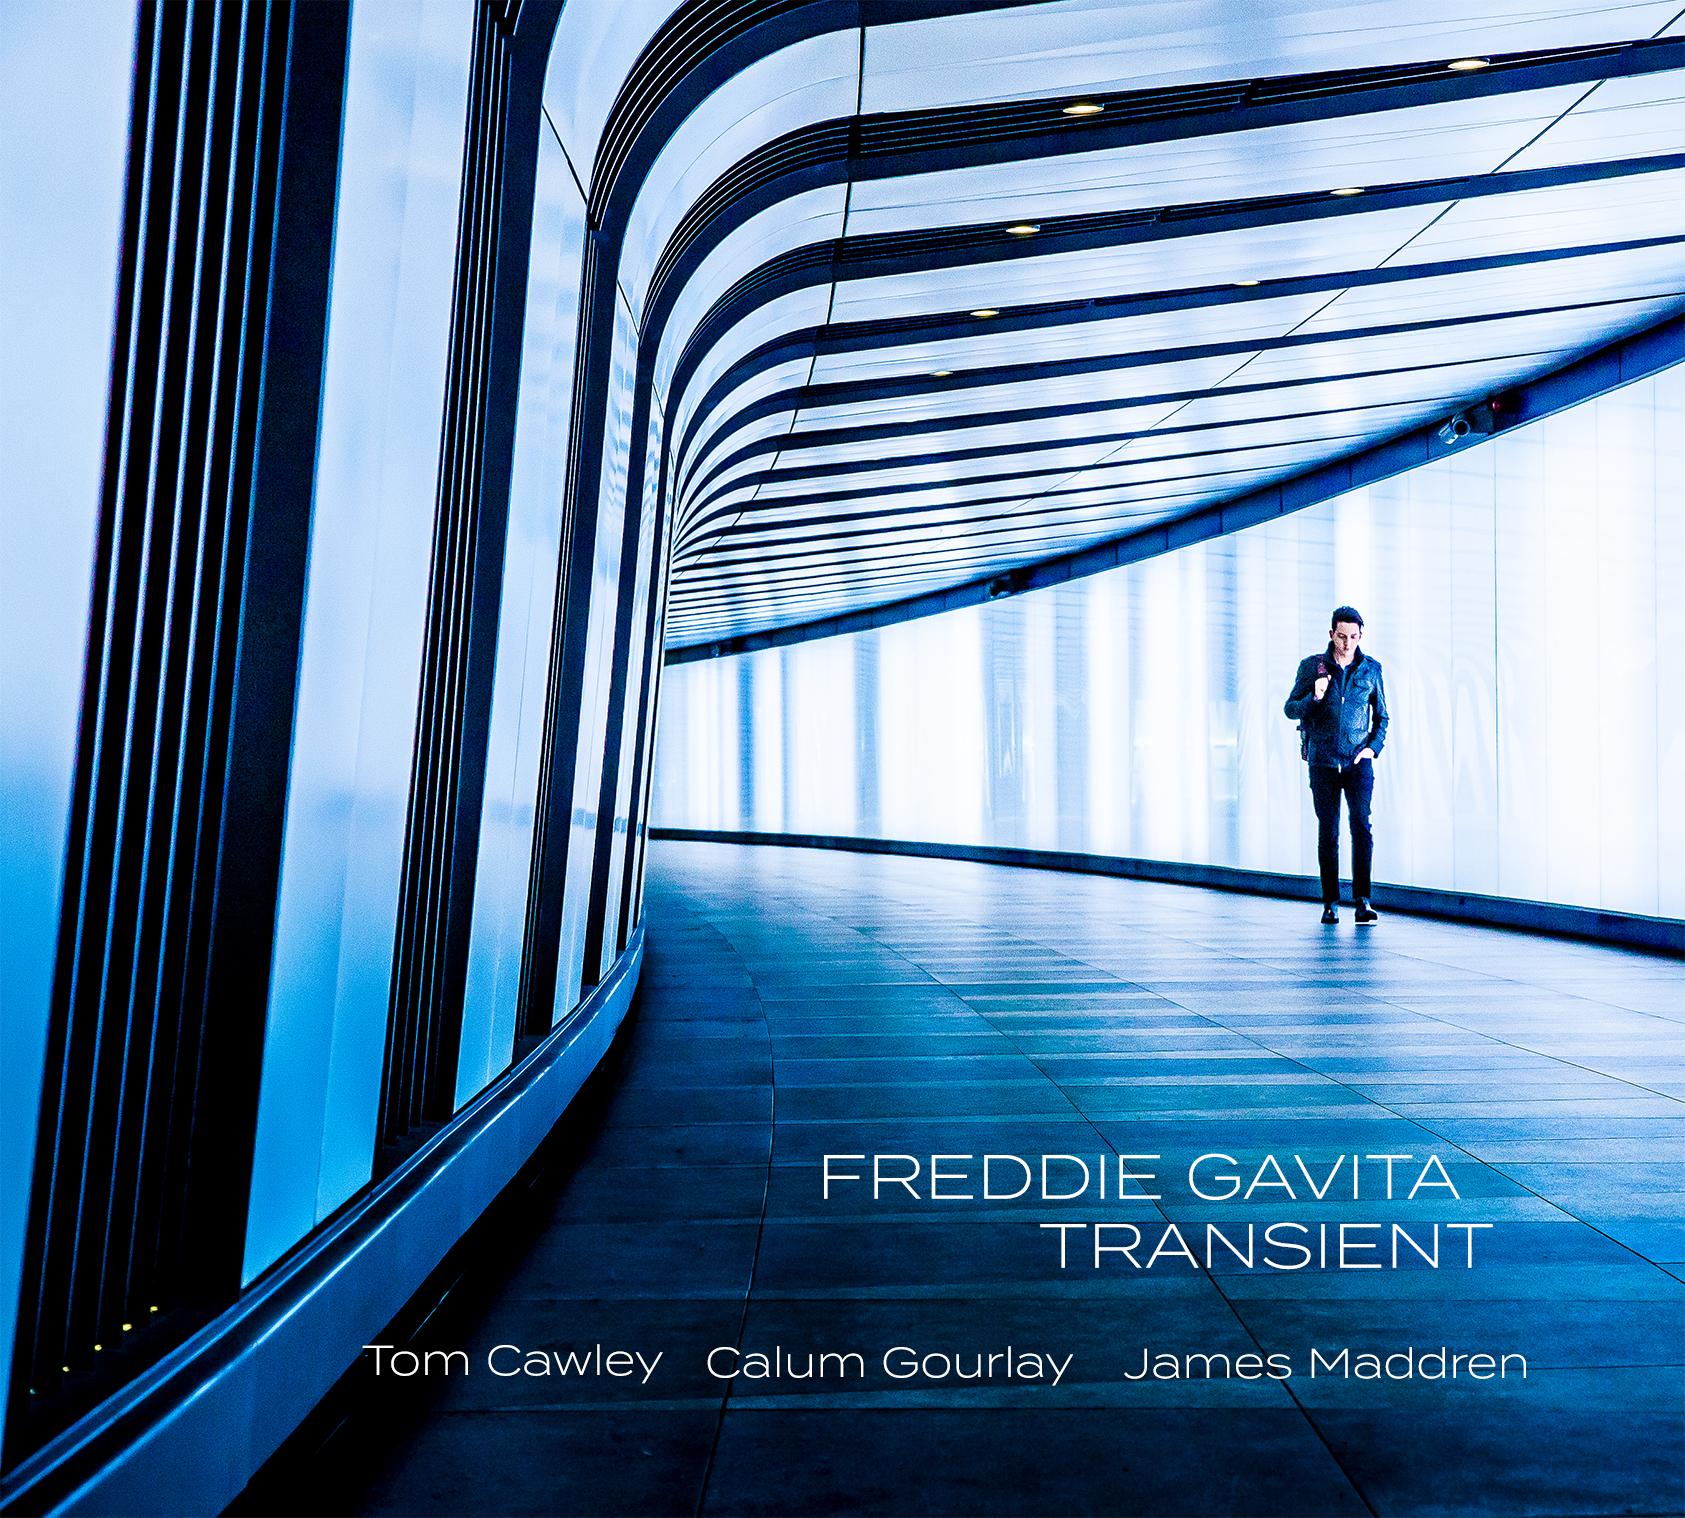 Freddie Gavita Transient